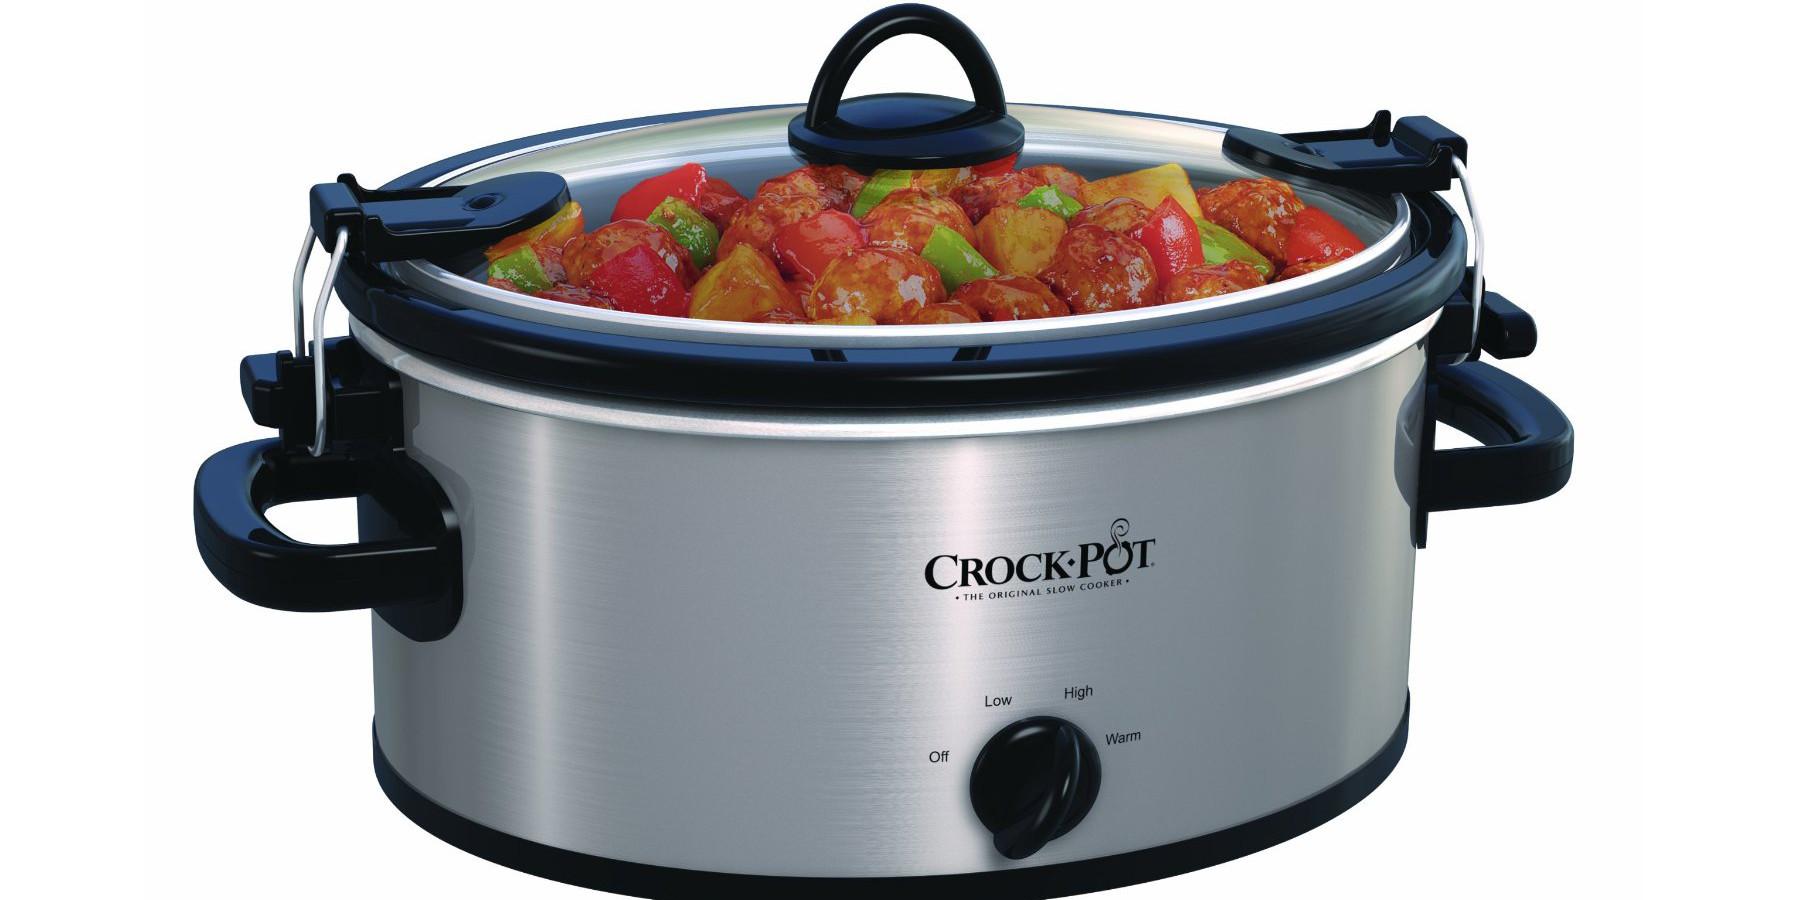 Stainless-Steel Crock-Pot - 4-Quart Oval Slow Cooker (SCCPVL400-3